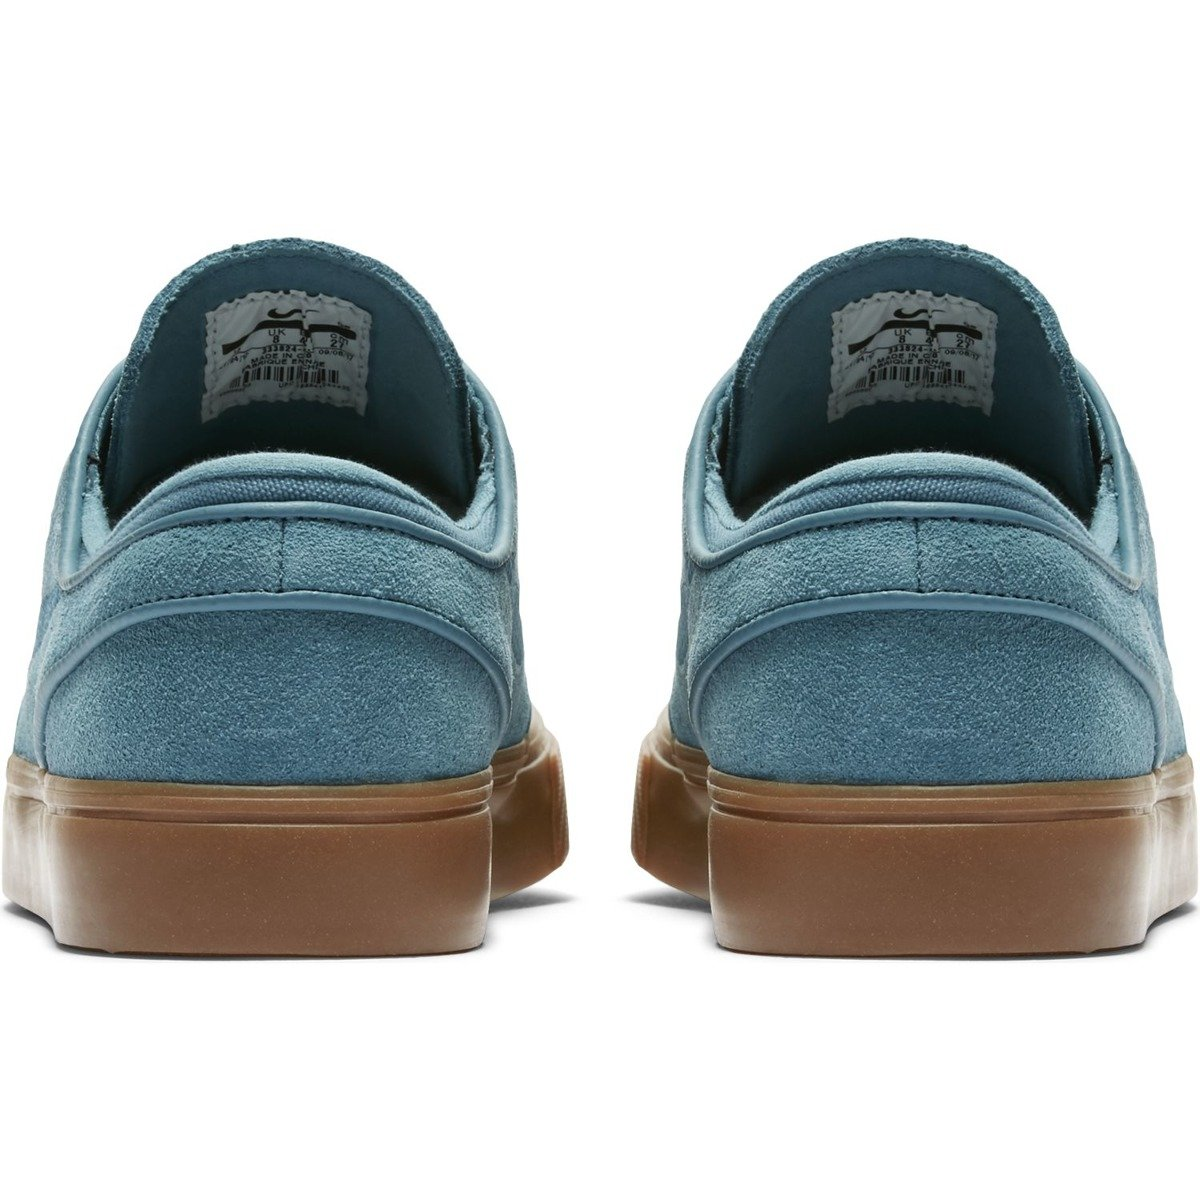 ... shoes nike zoom stefan janoski noise aqua/noise aqua-thunder blue ...